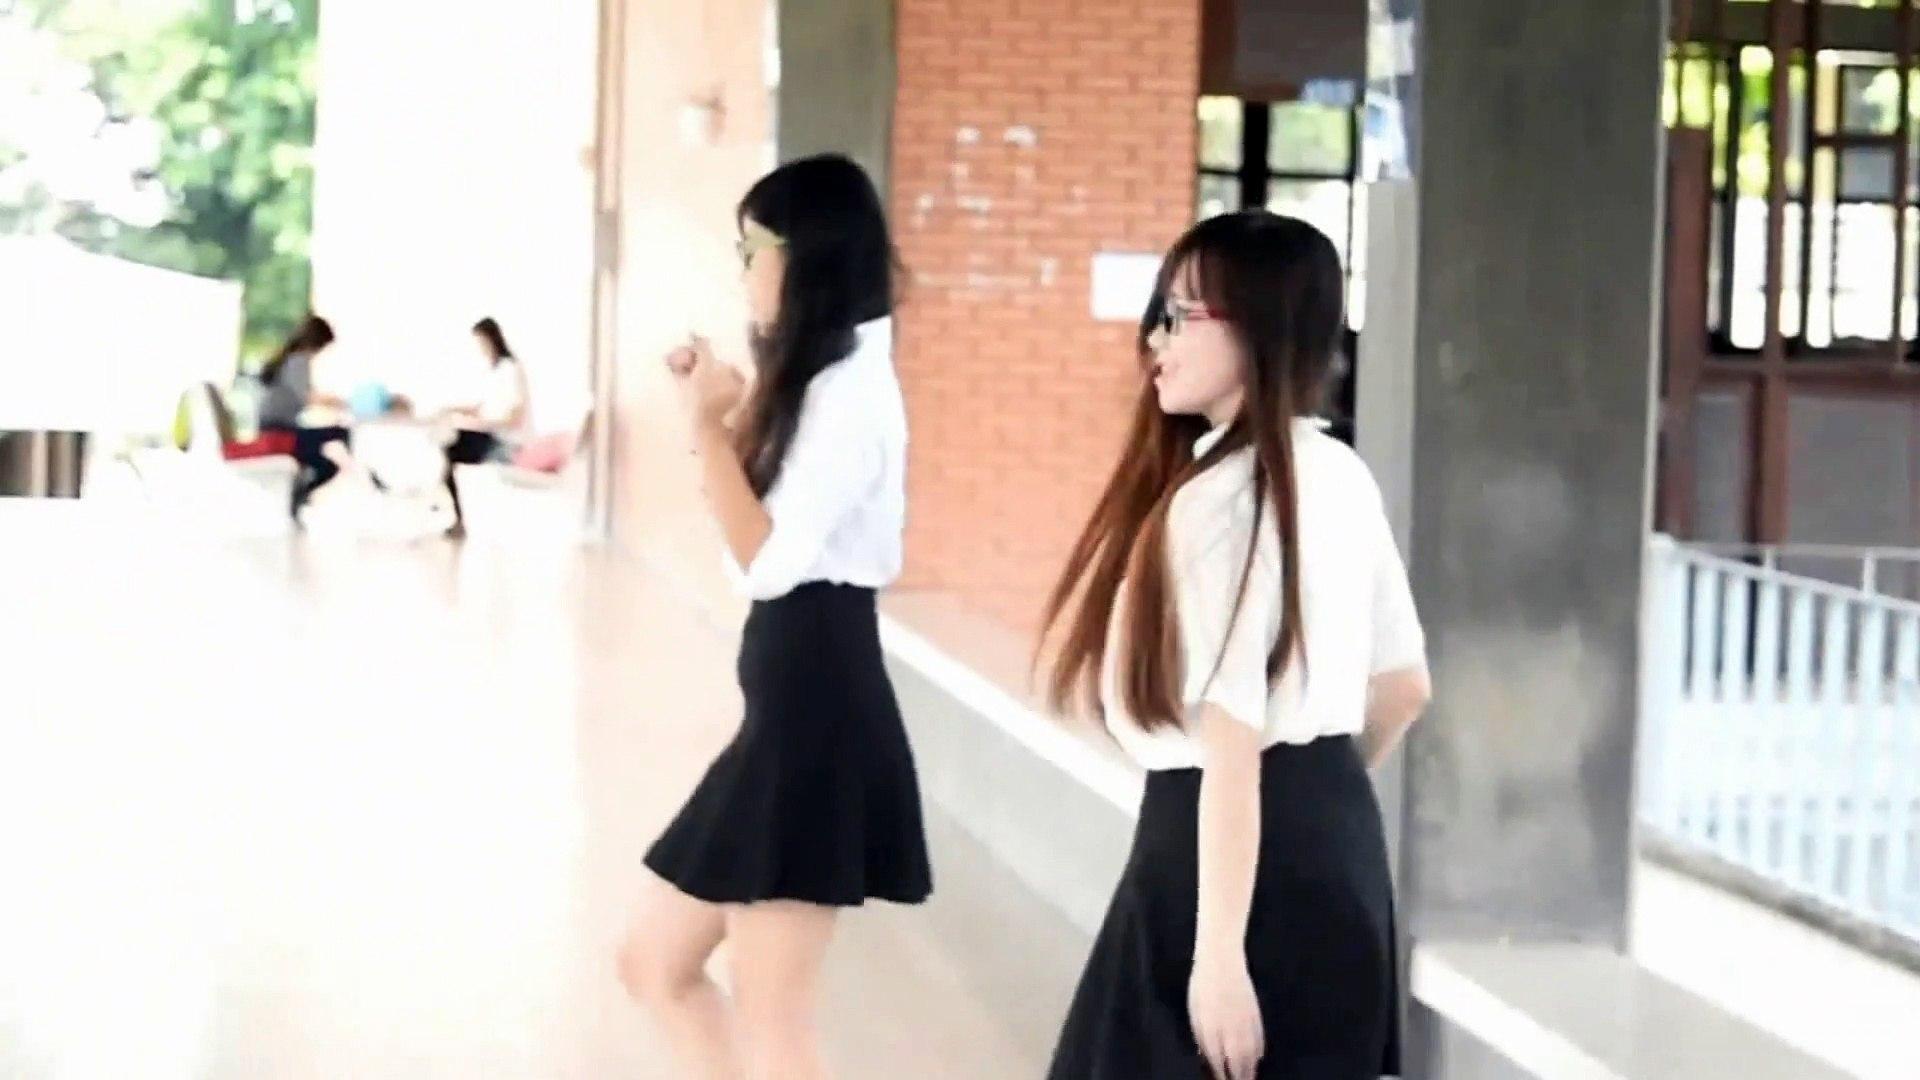 Chinese girls dancing on indian song beautiful girls performing beautiful dance